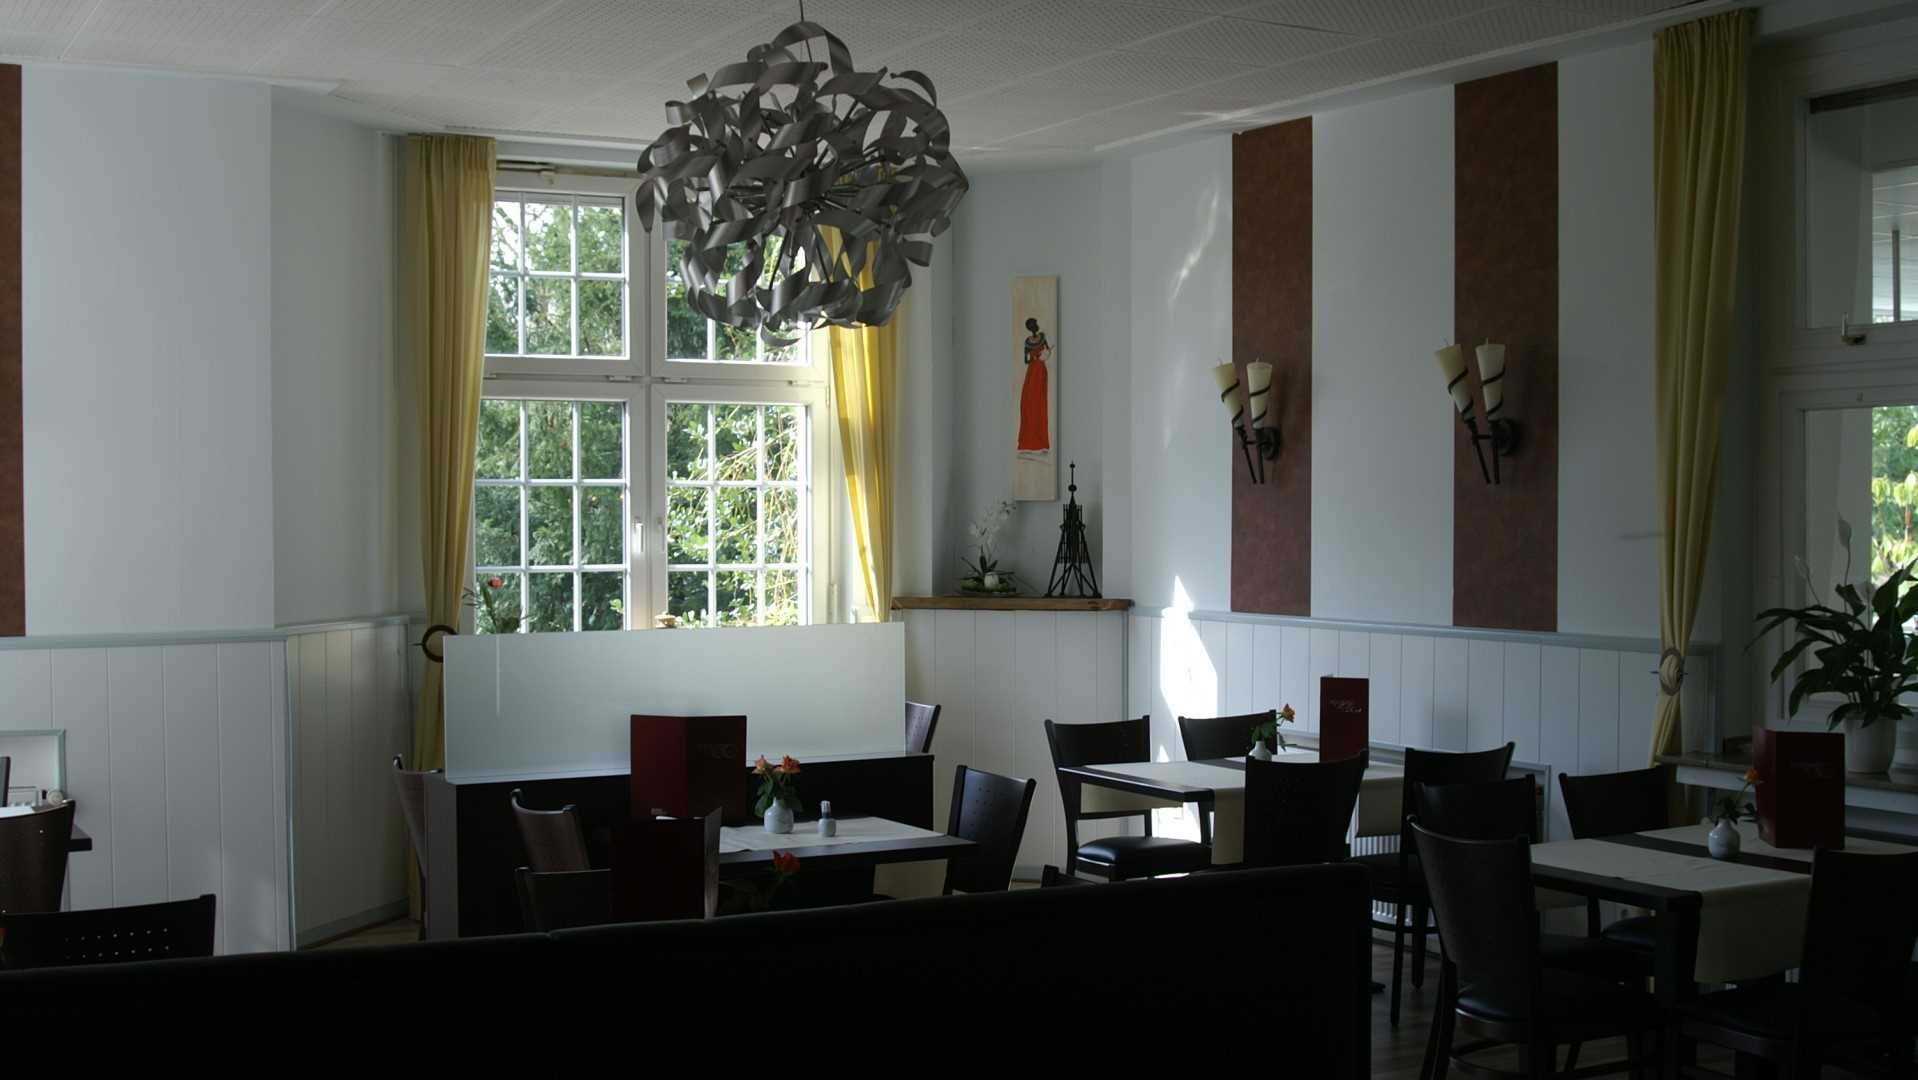 Volksgarten Mengede - Hotel | Restaurant | Biergarten | Café - Café